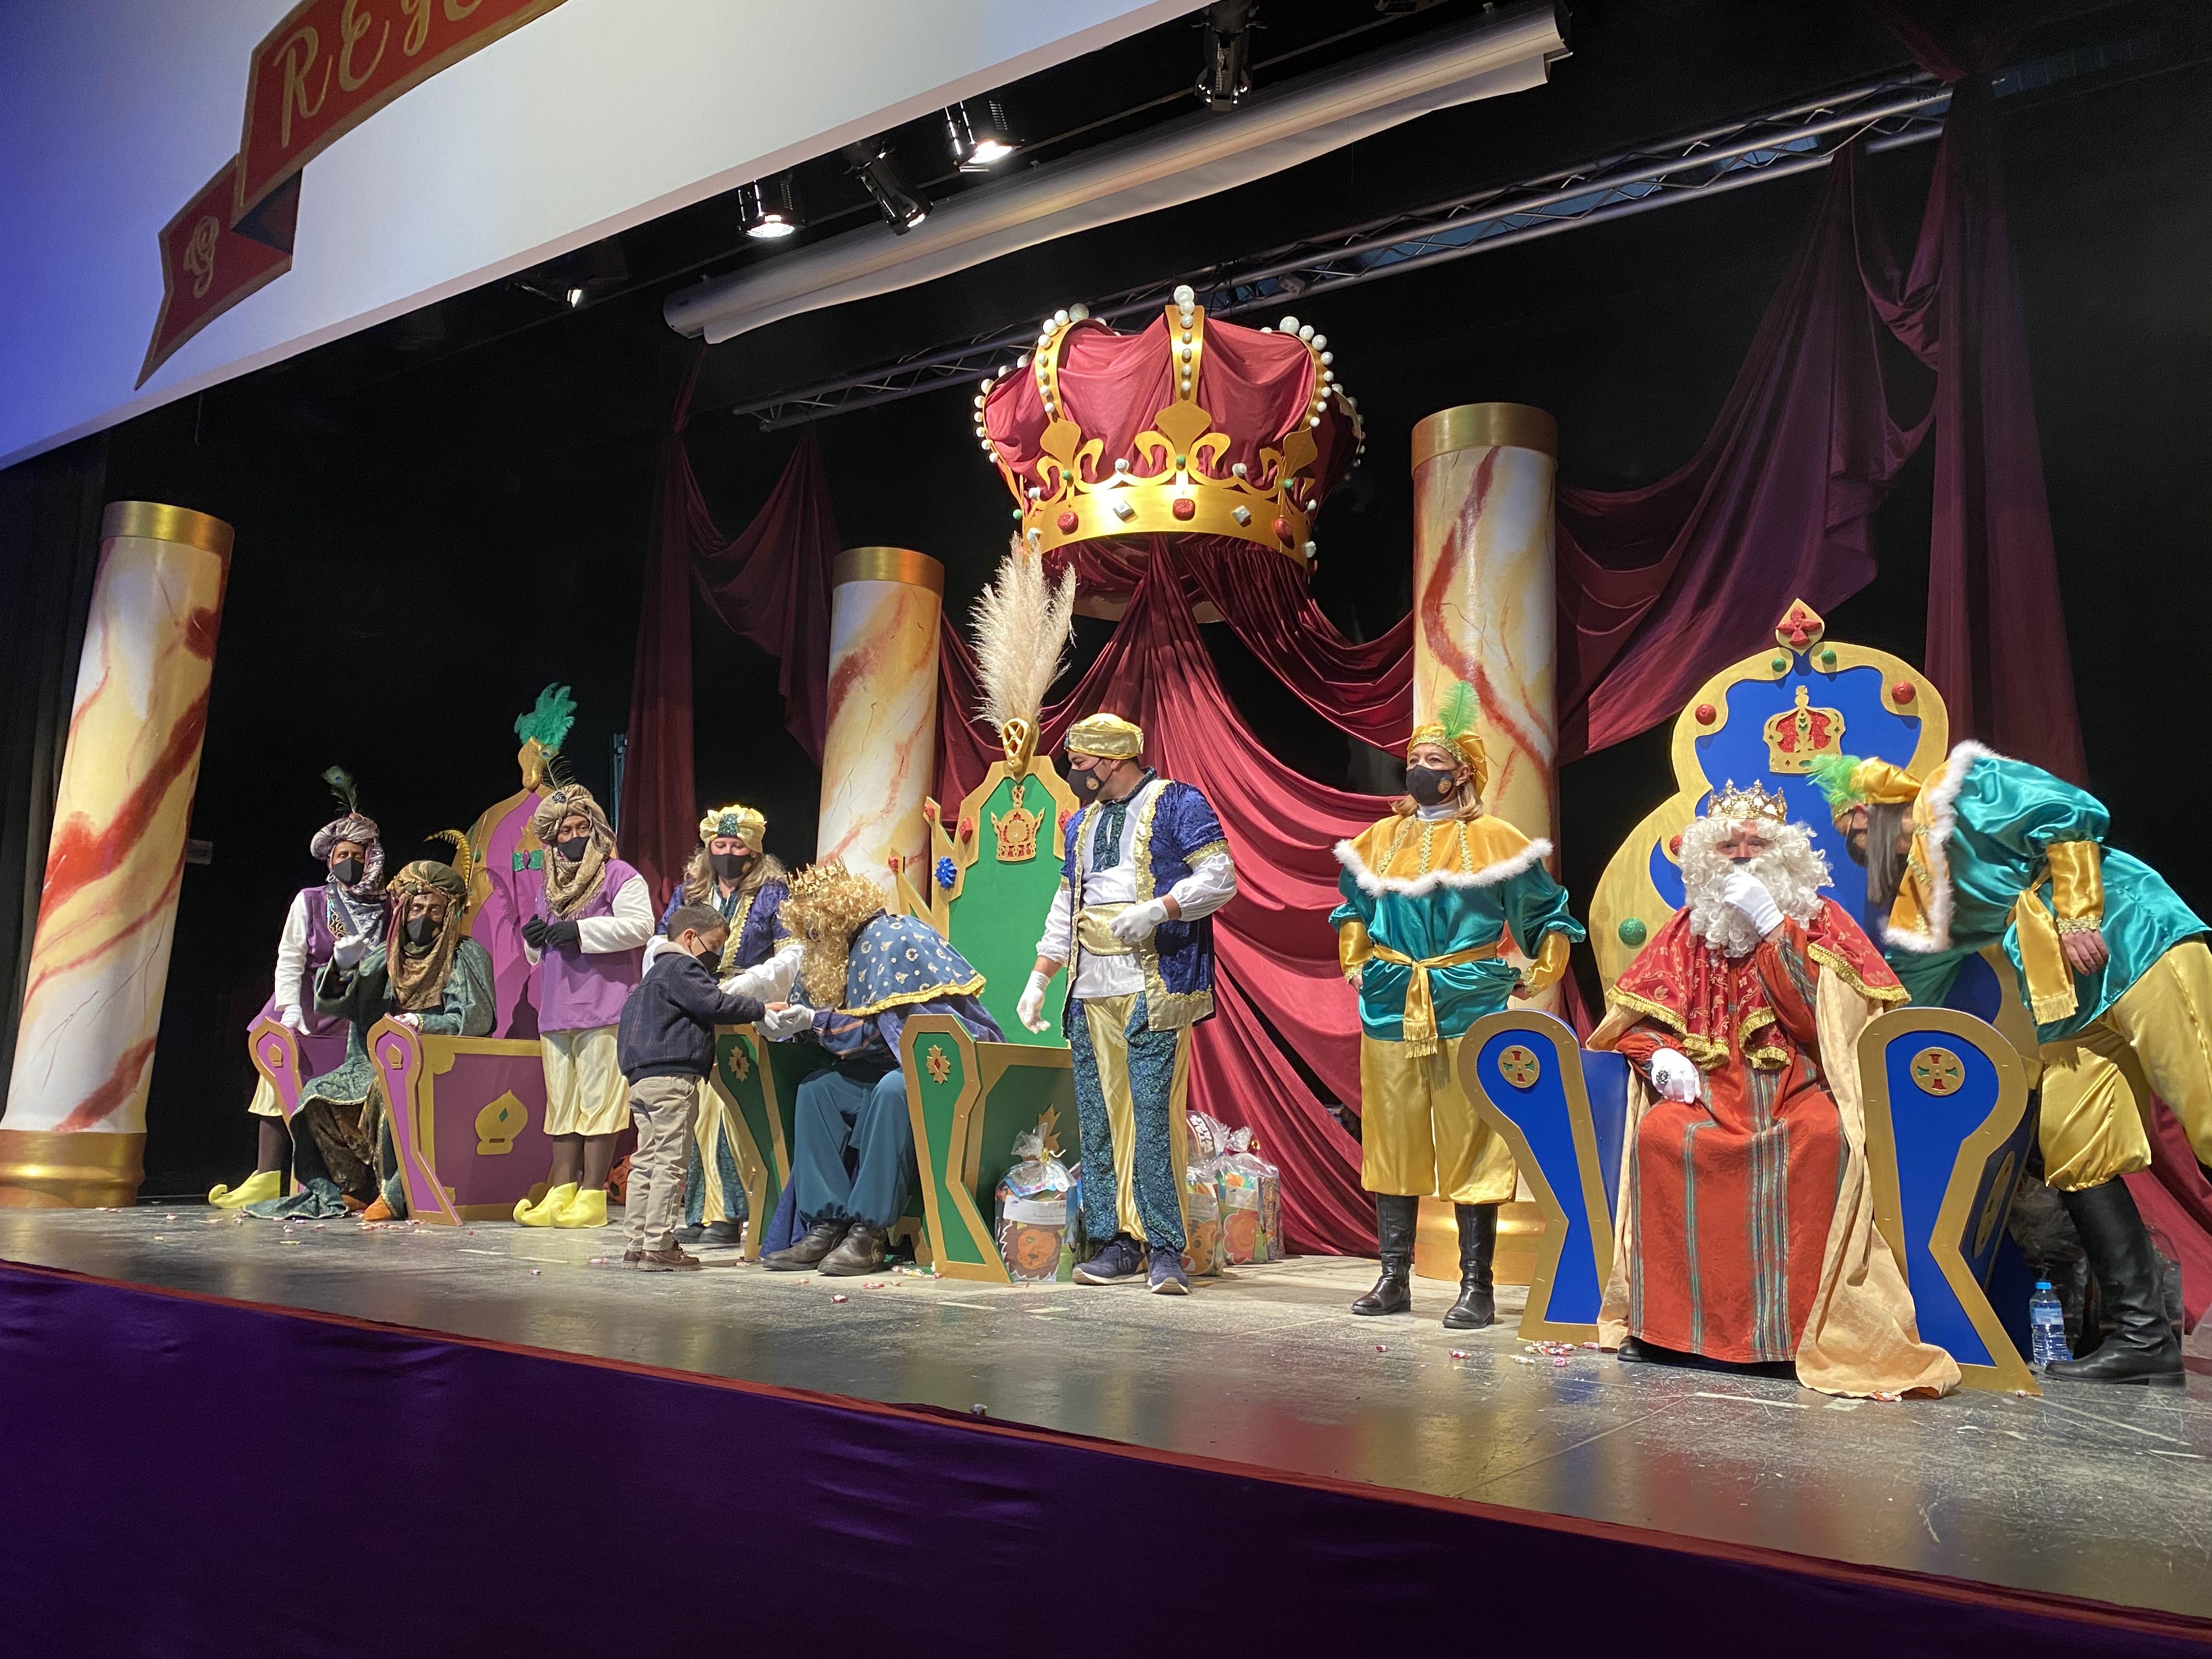 Christmas and Three Kings installation in Peñaflor, Spain